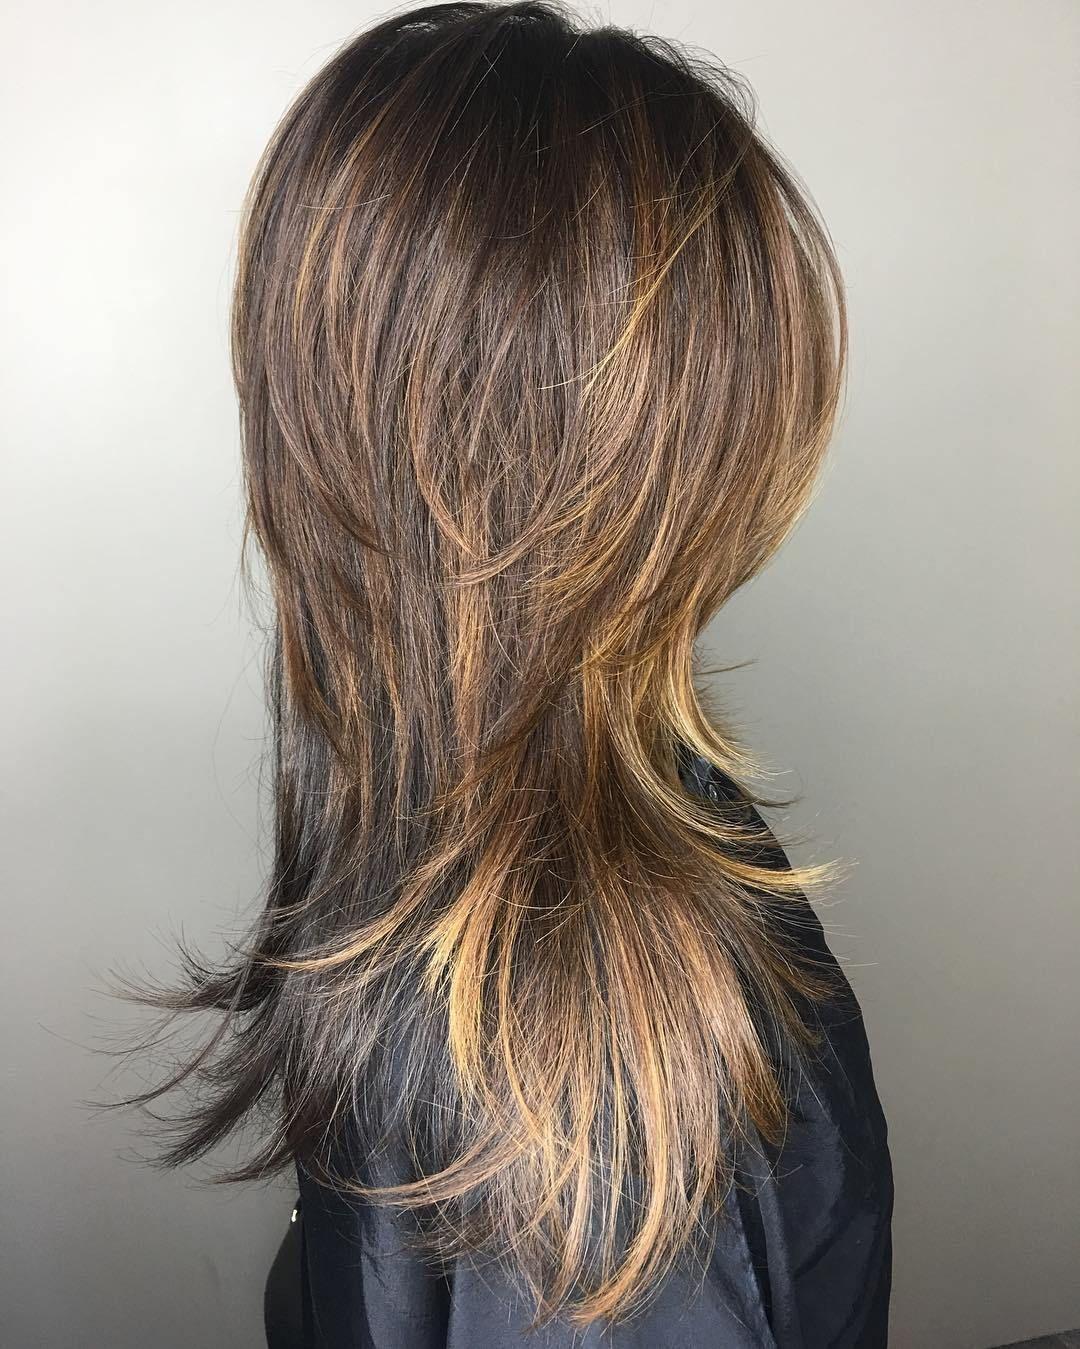 Pin On Hair Style Ideas